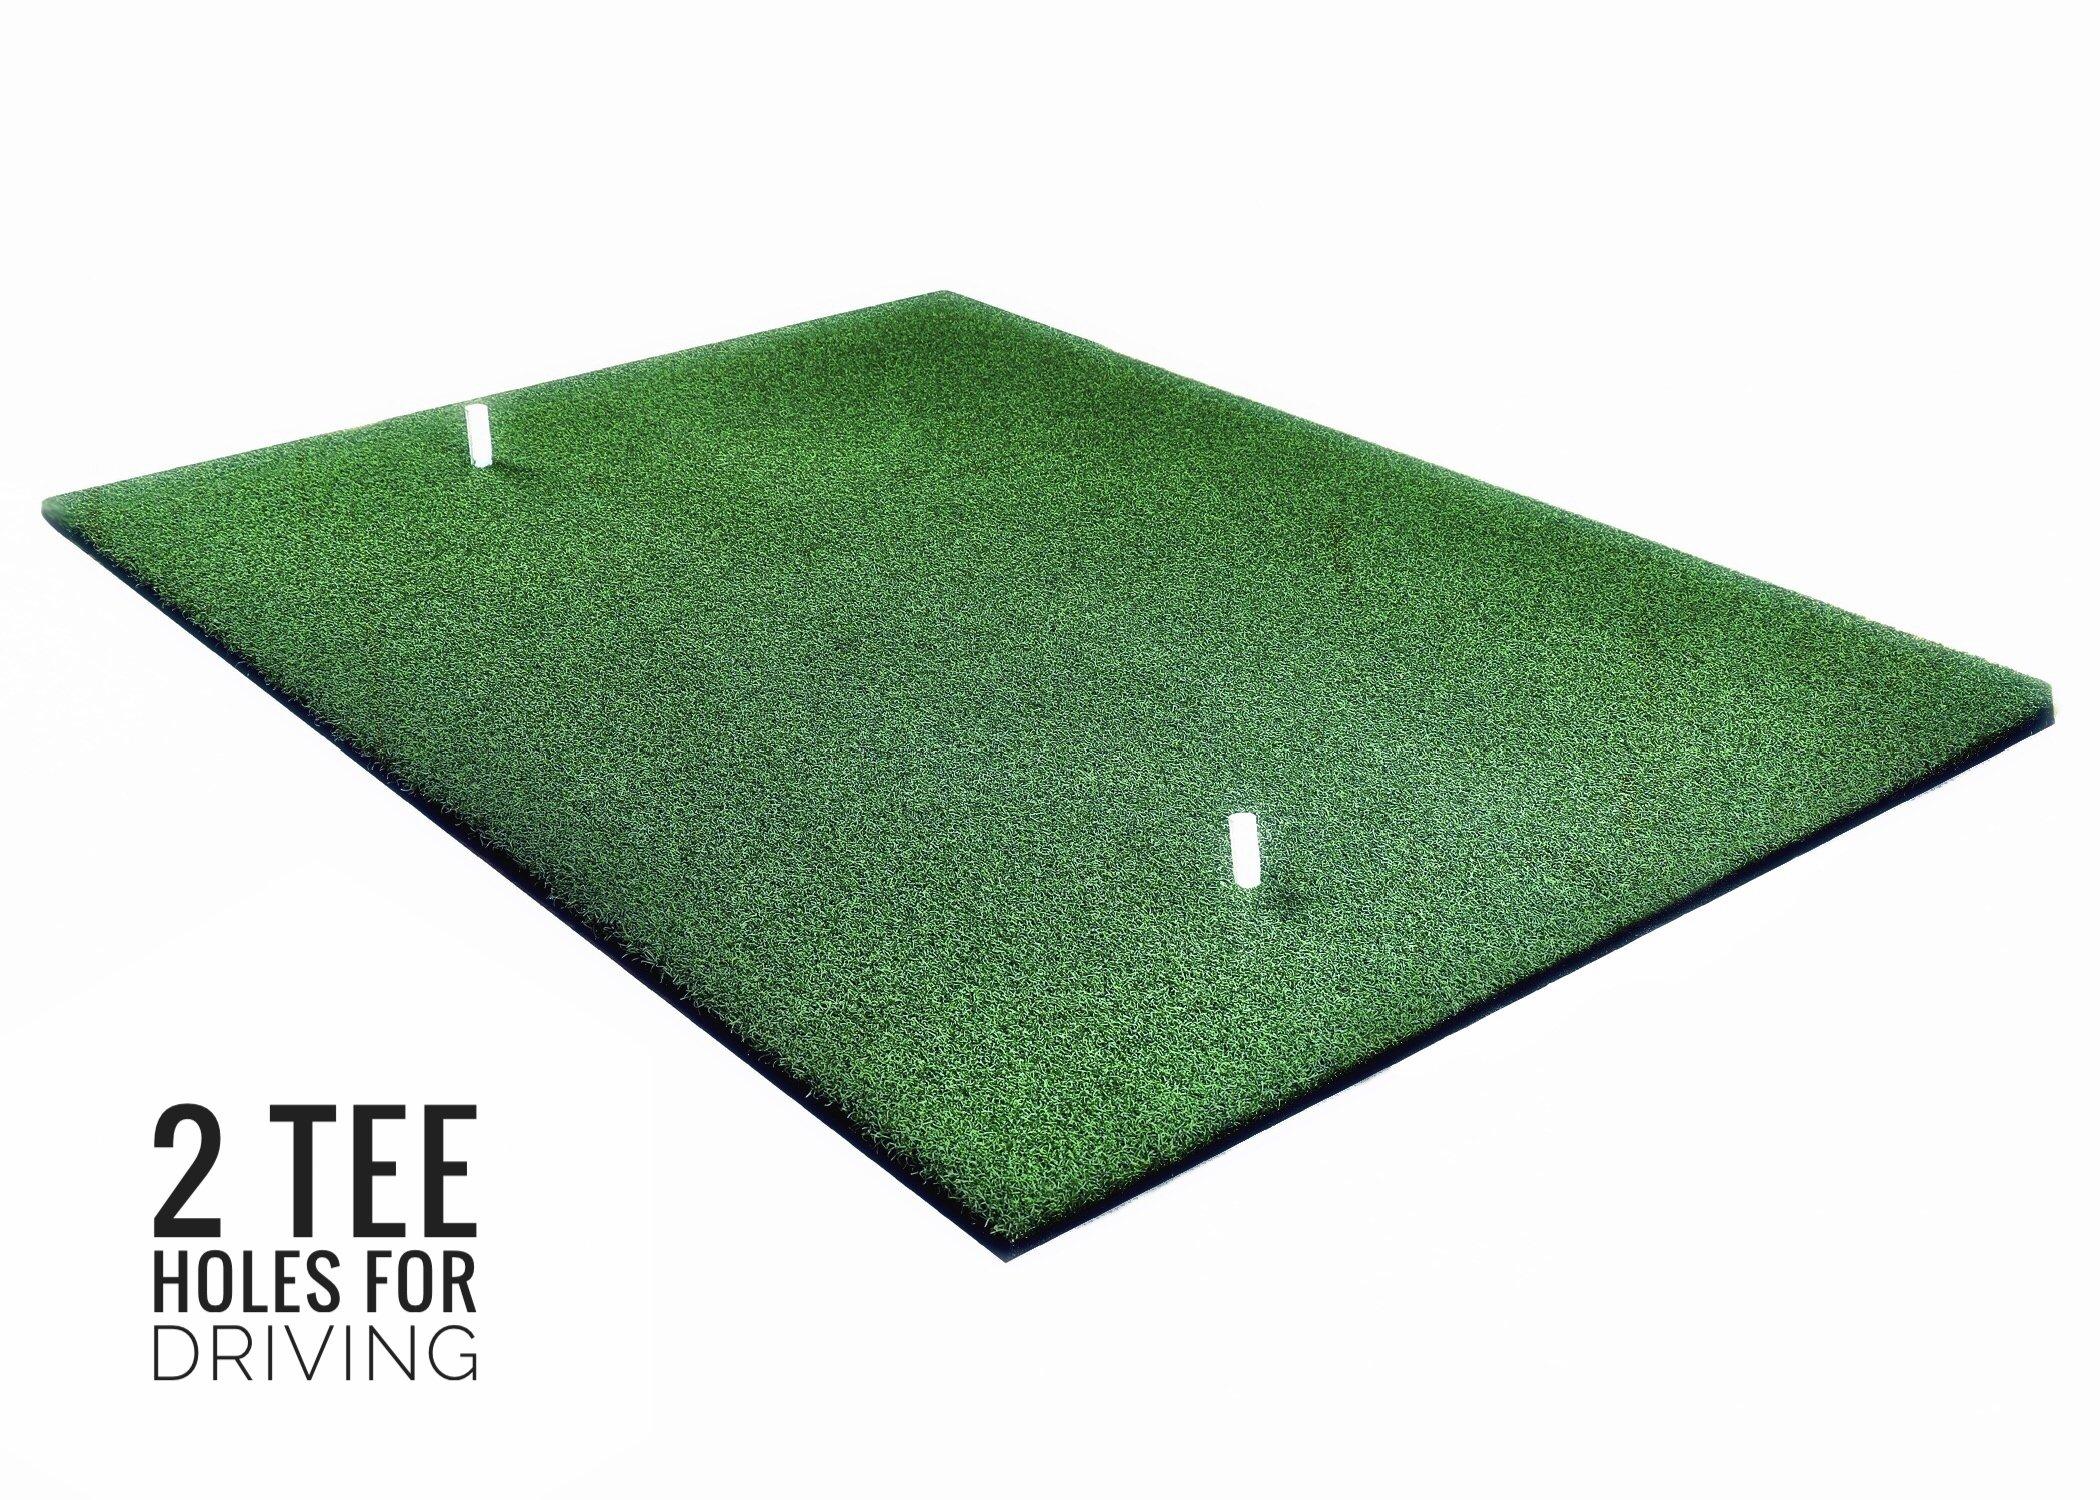 Fairway One Golf Hitting Mat (48in x 36in) by Motivo Golf by Motivo Golf (Image #6)